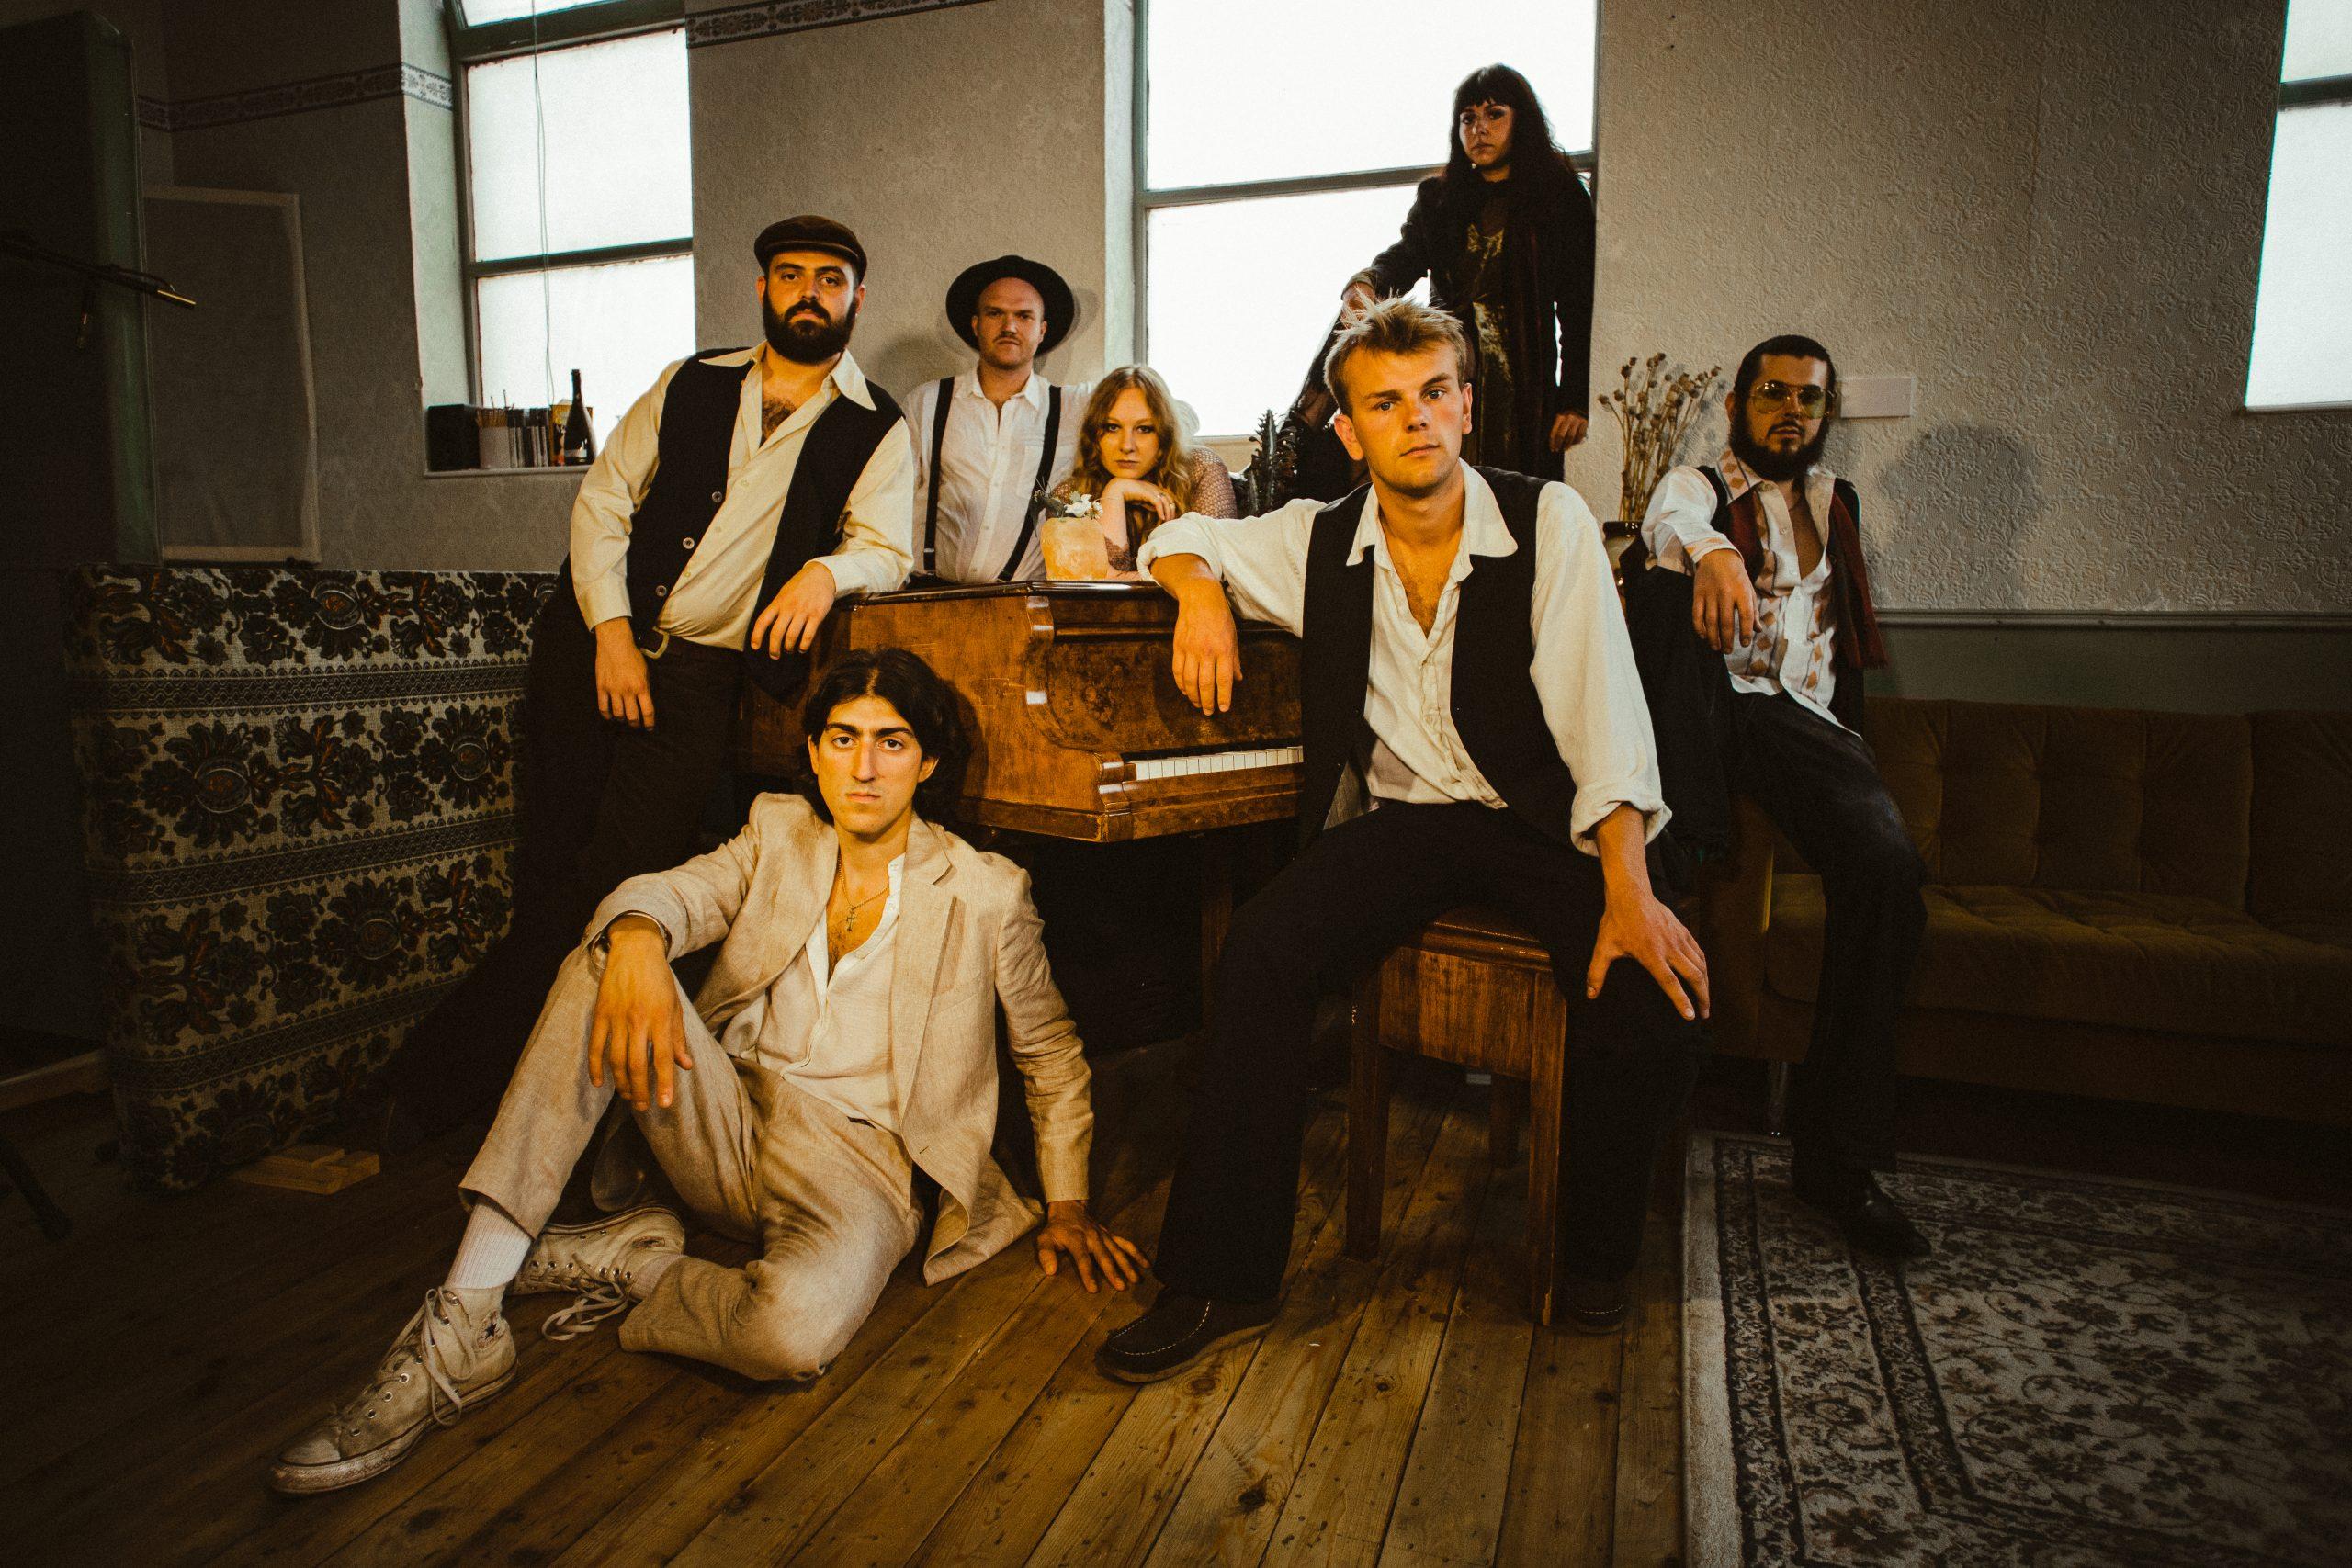 The Belgrave House Band: Fleetwood Mac's Rumours